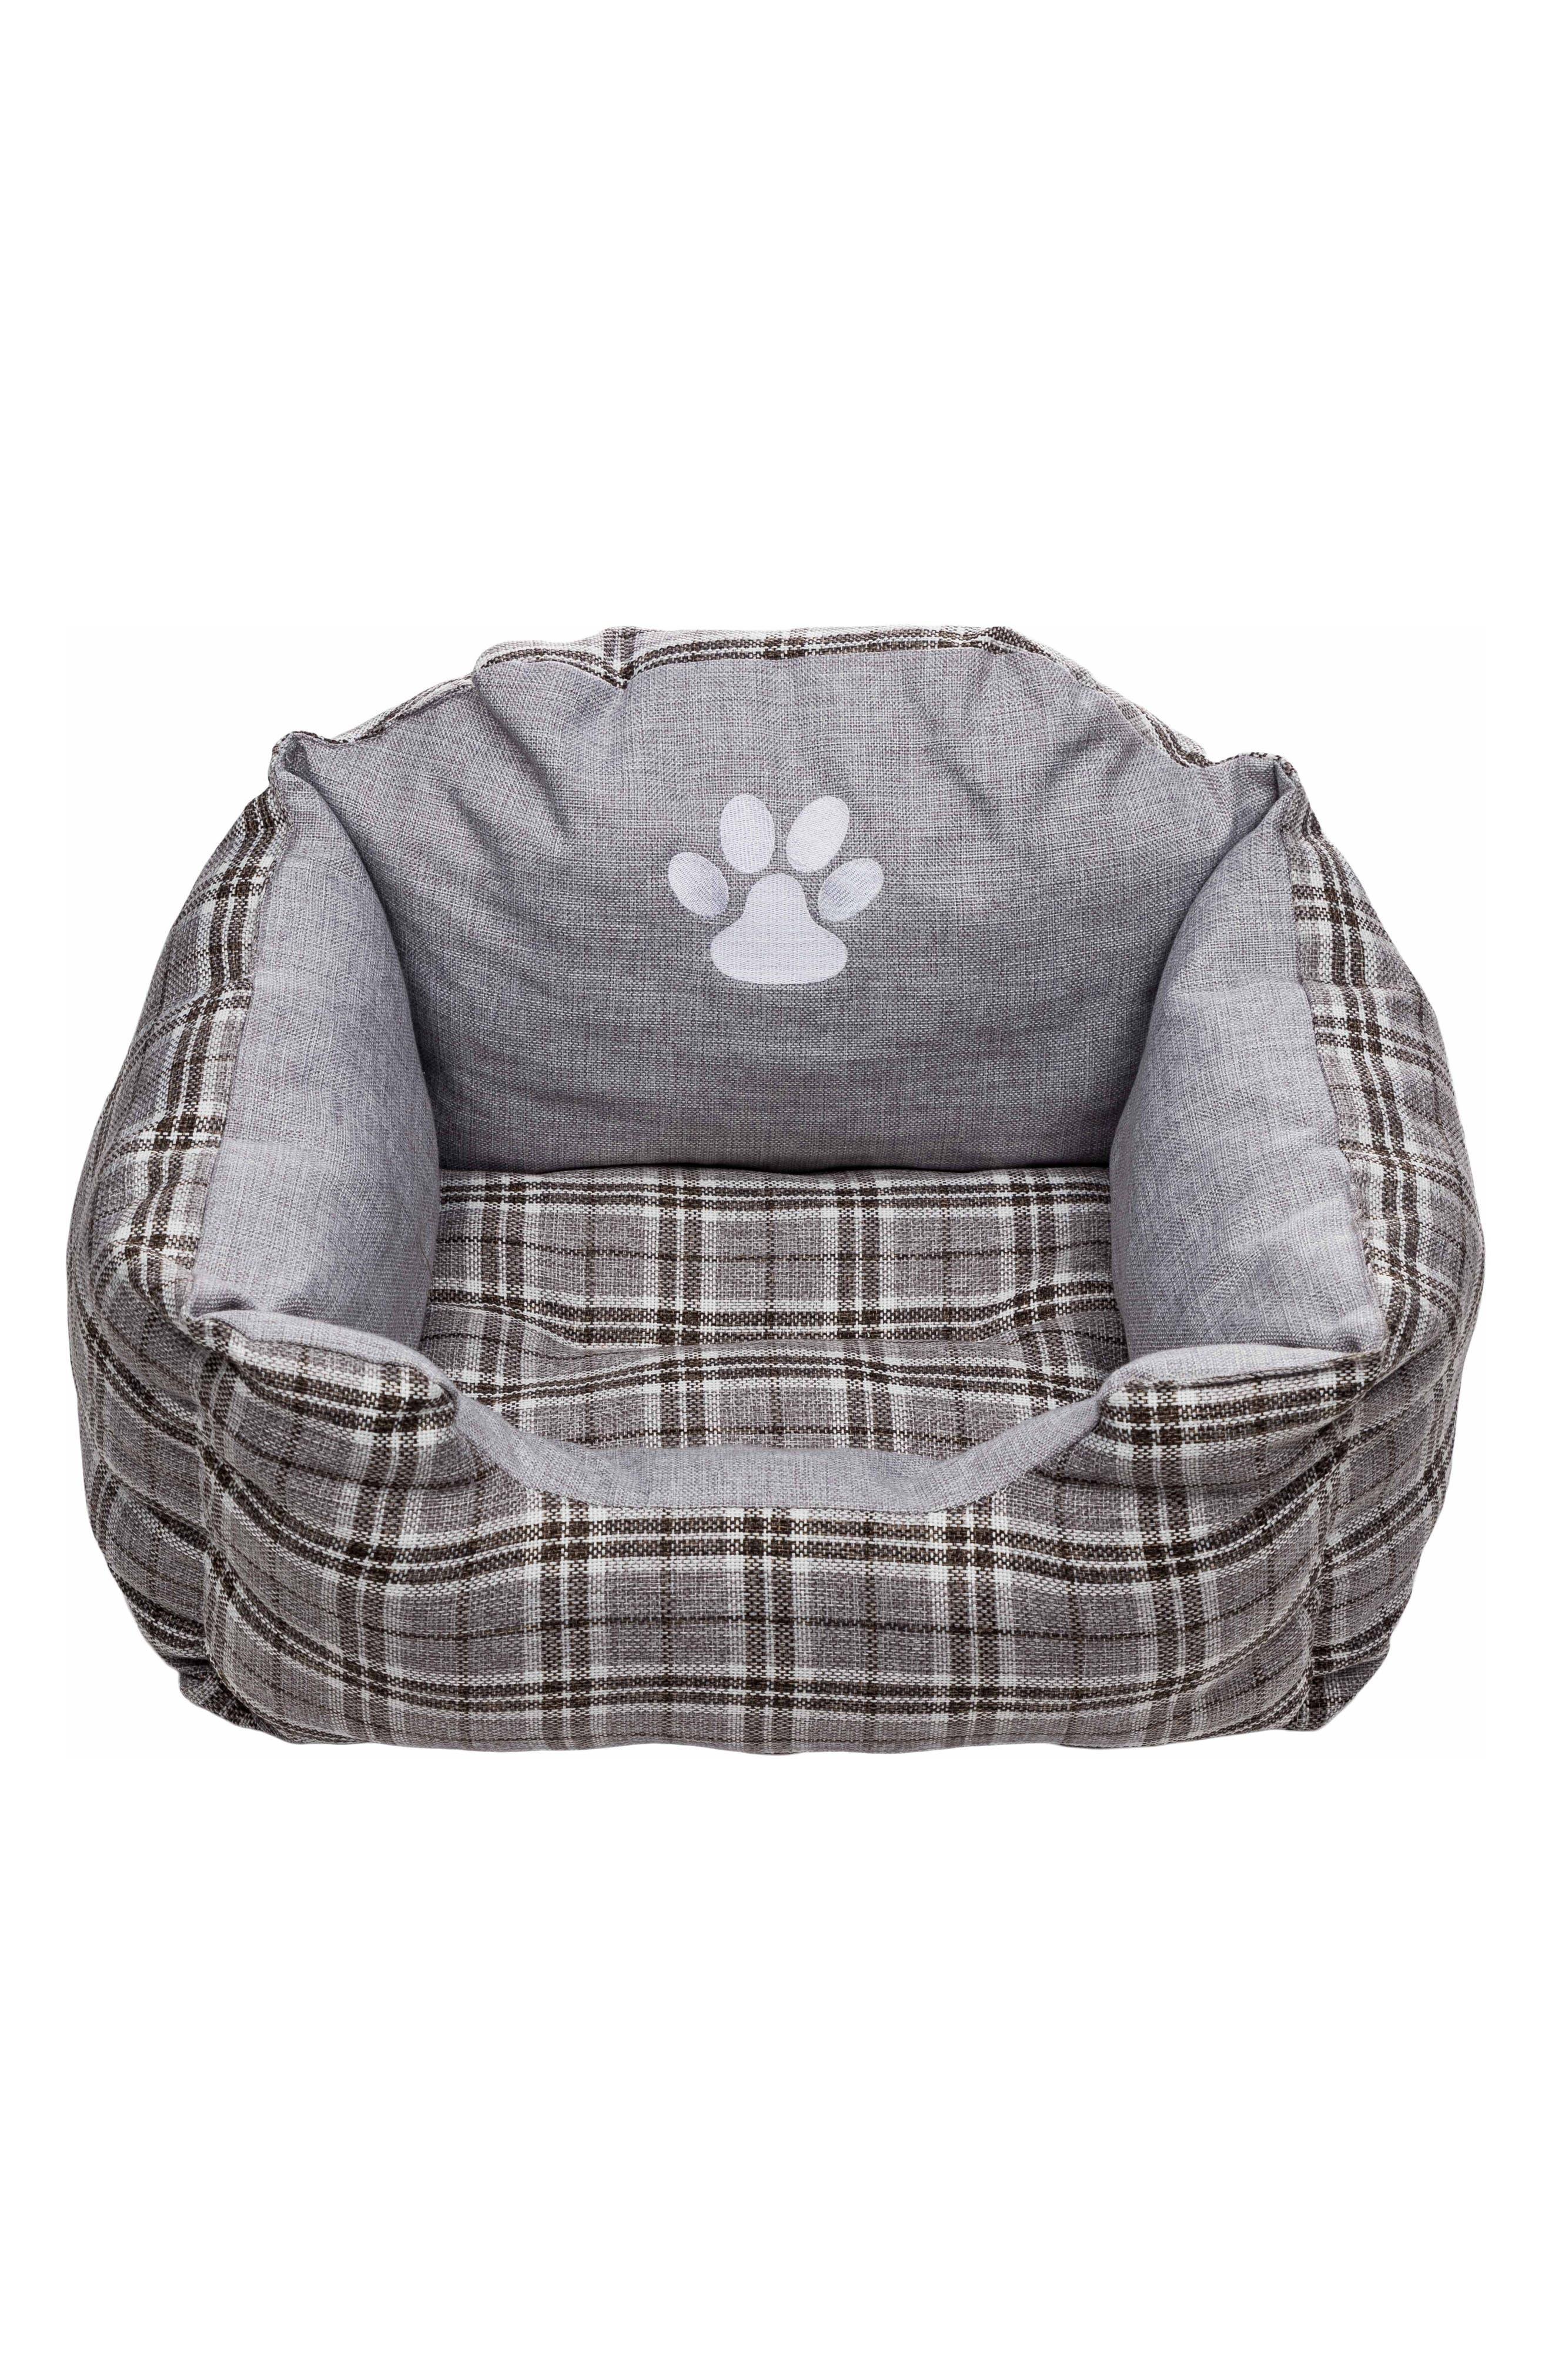 Harlee Small Square Pet Bed,                             Main thumbnail 1, color,                             020